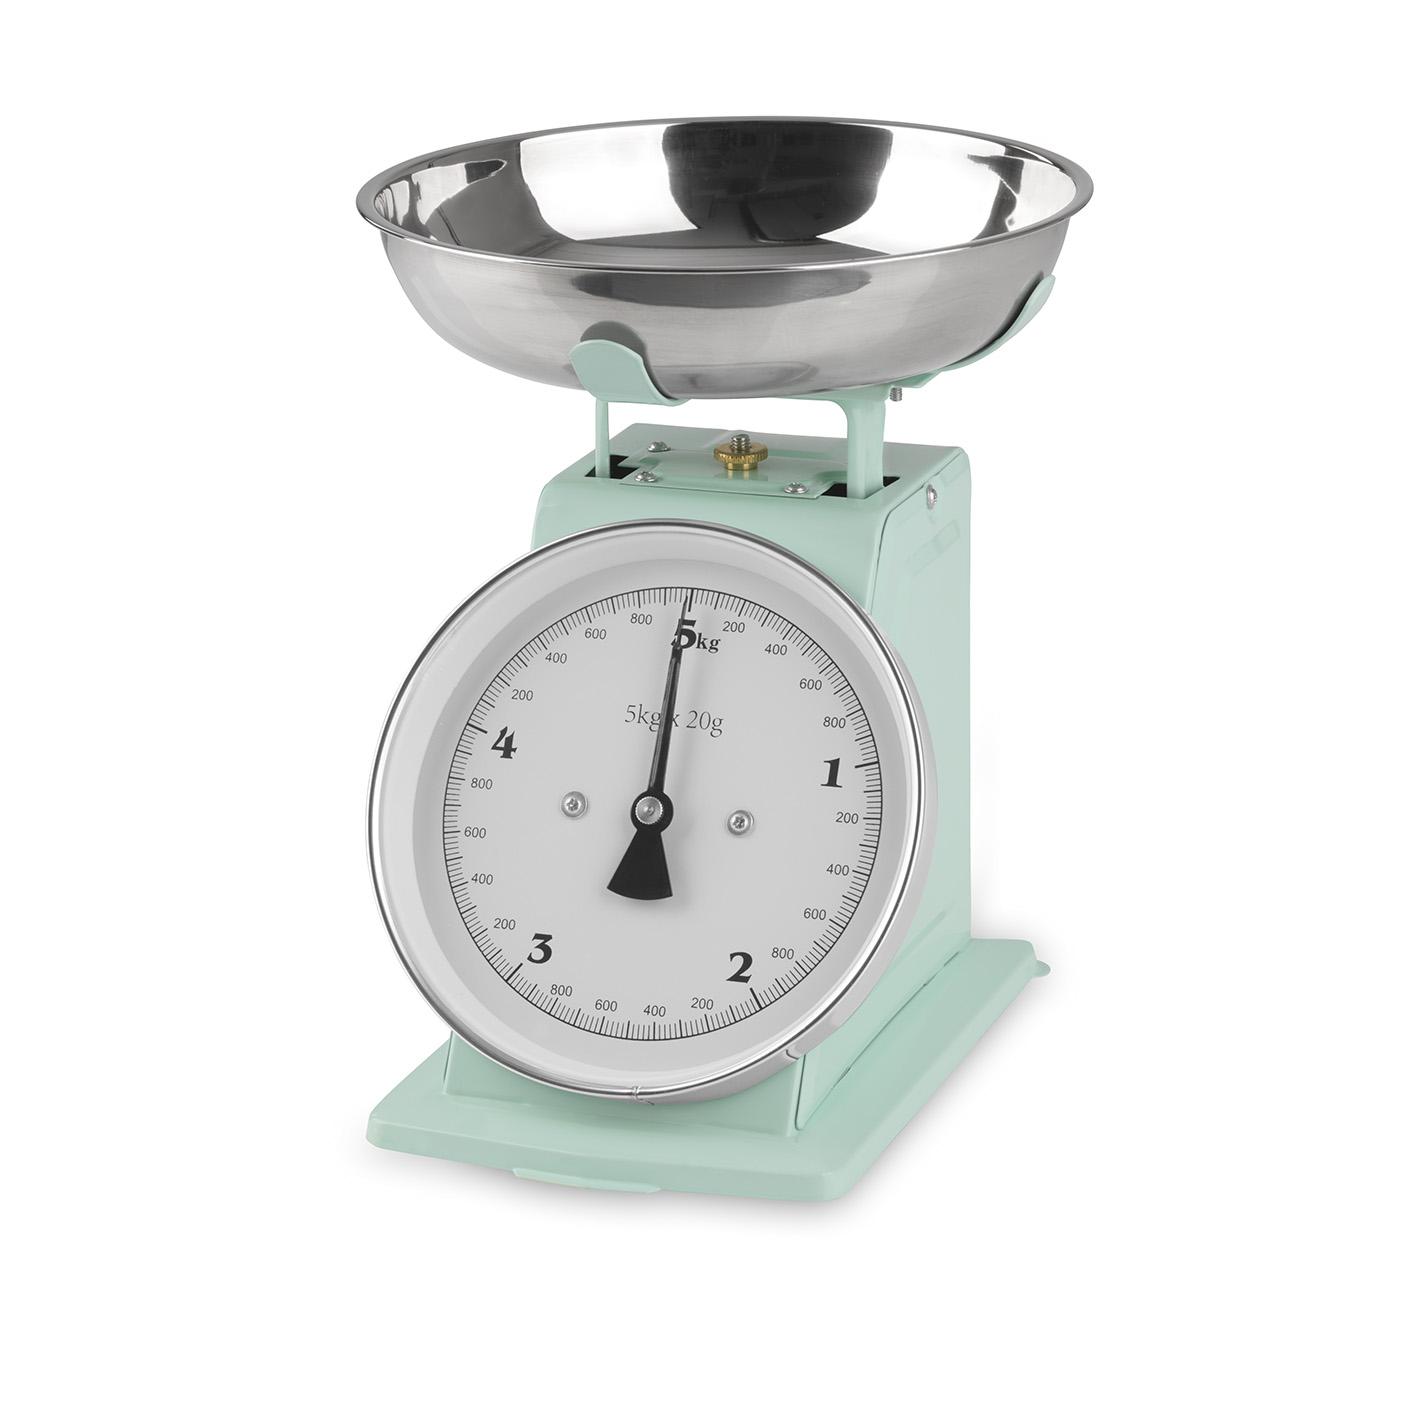 Gourmetmaxx Bilancia da Cucina Incl Coppa Vintage Mint Analogico Meccanica